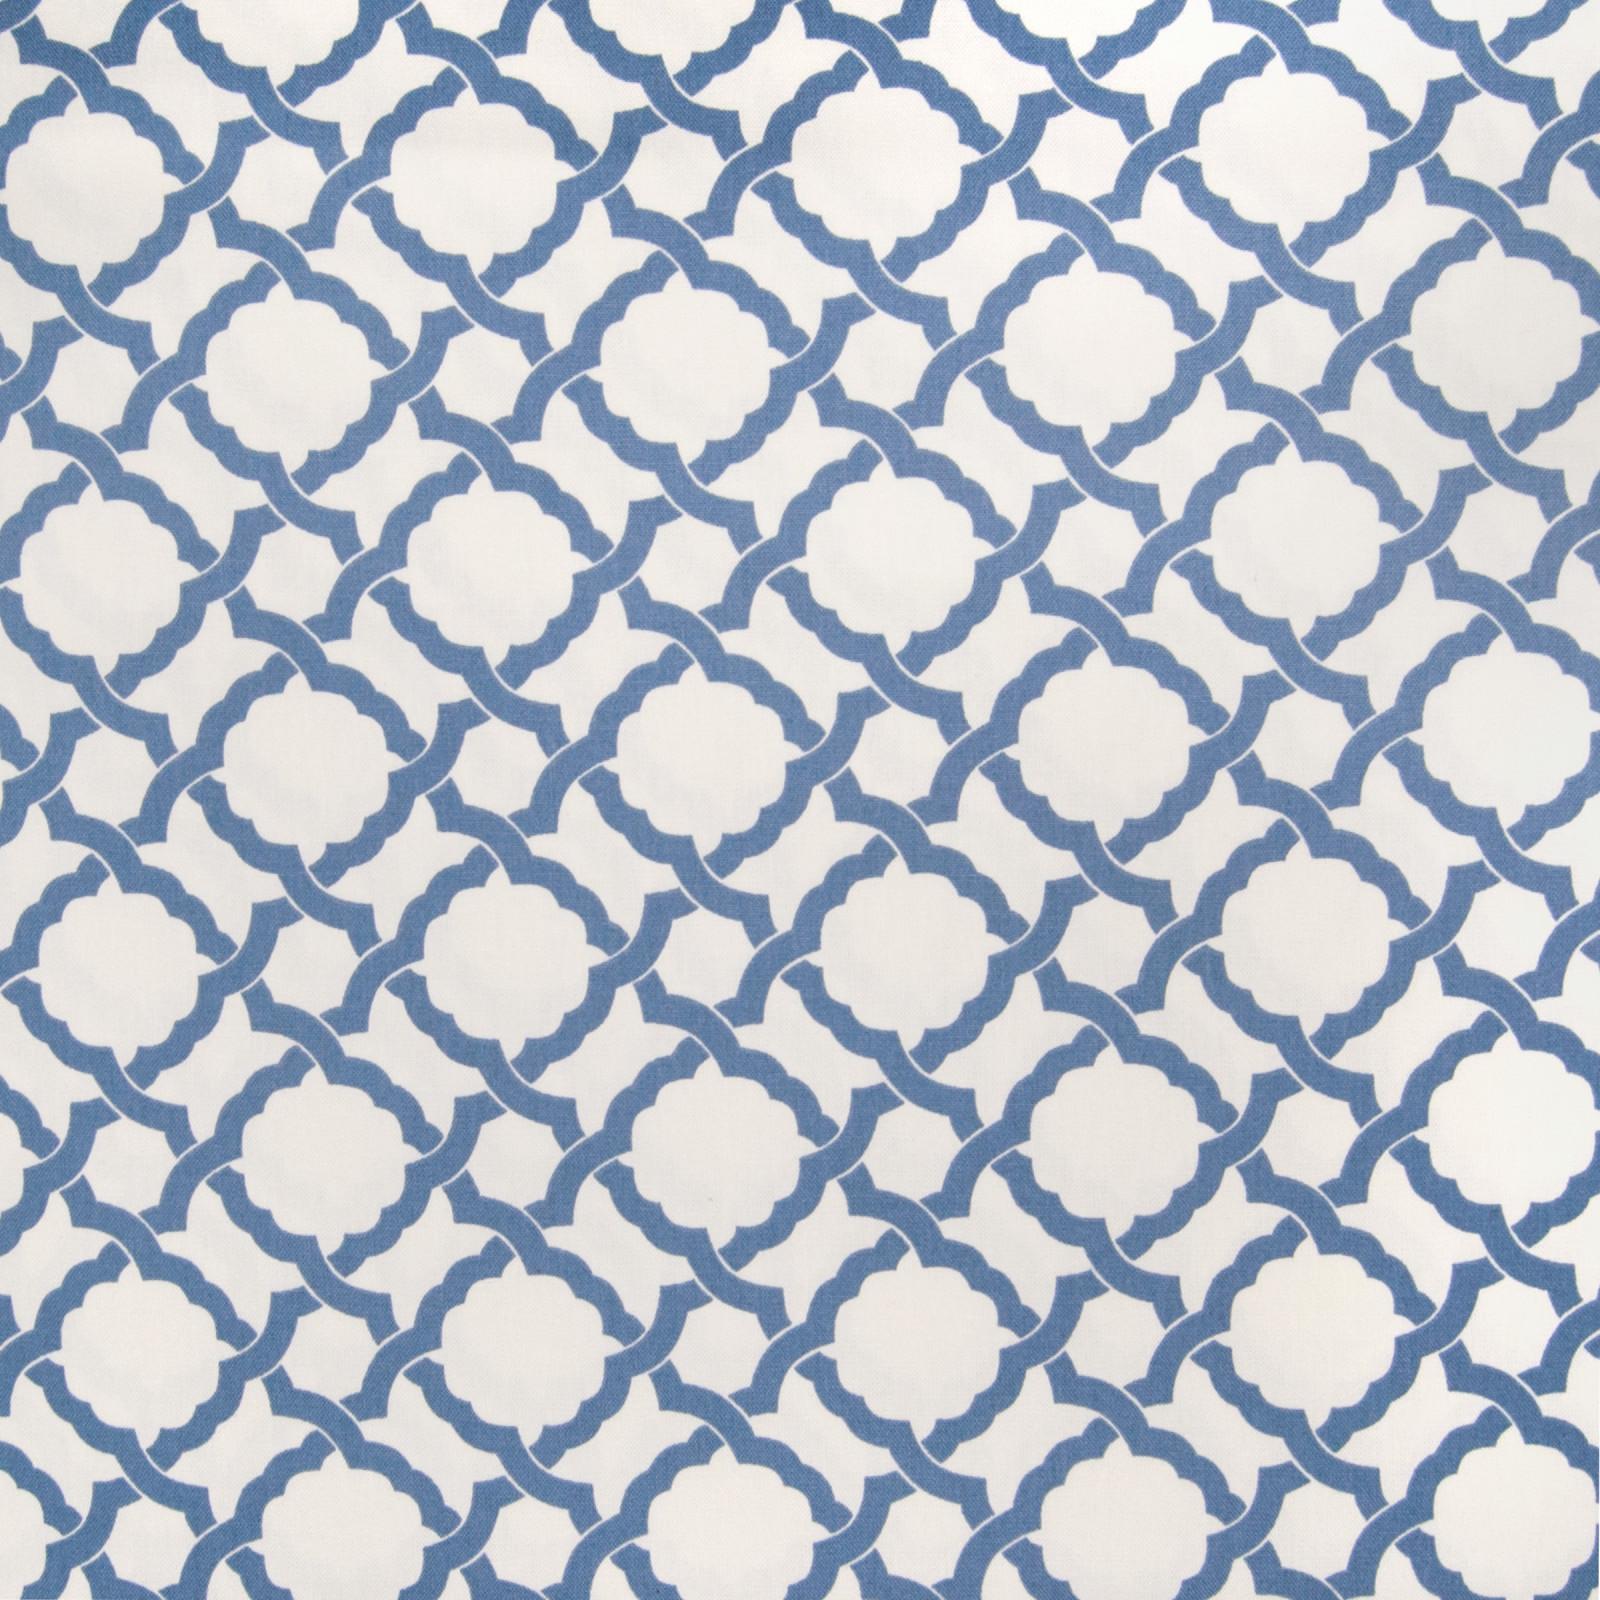 B3171 Periwinkle Greenhouse Fabrics